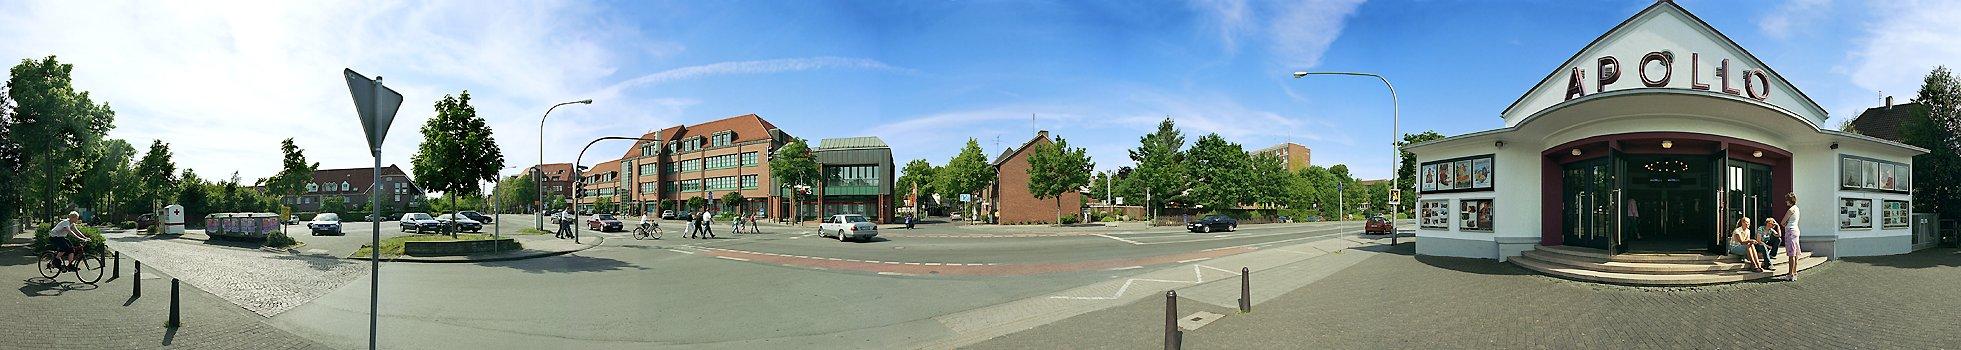 Apollo Kino Ibbenbüren Stadtpanorama